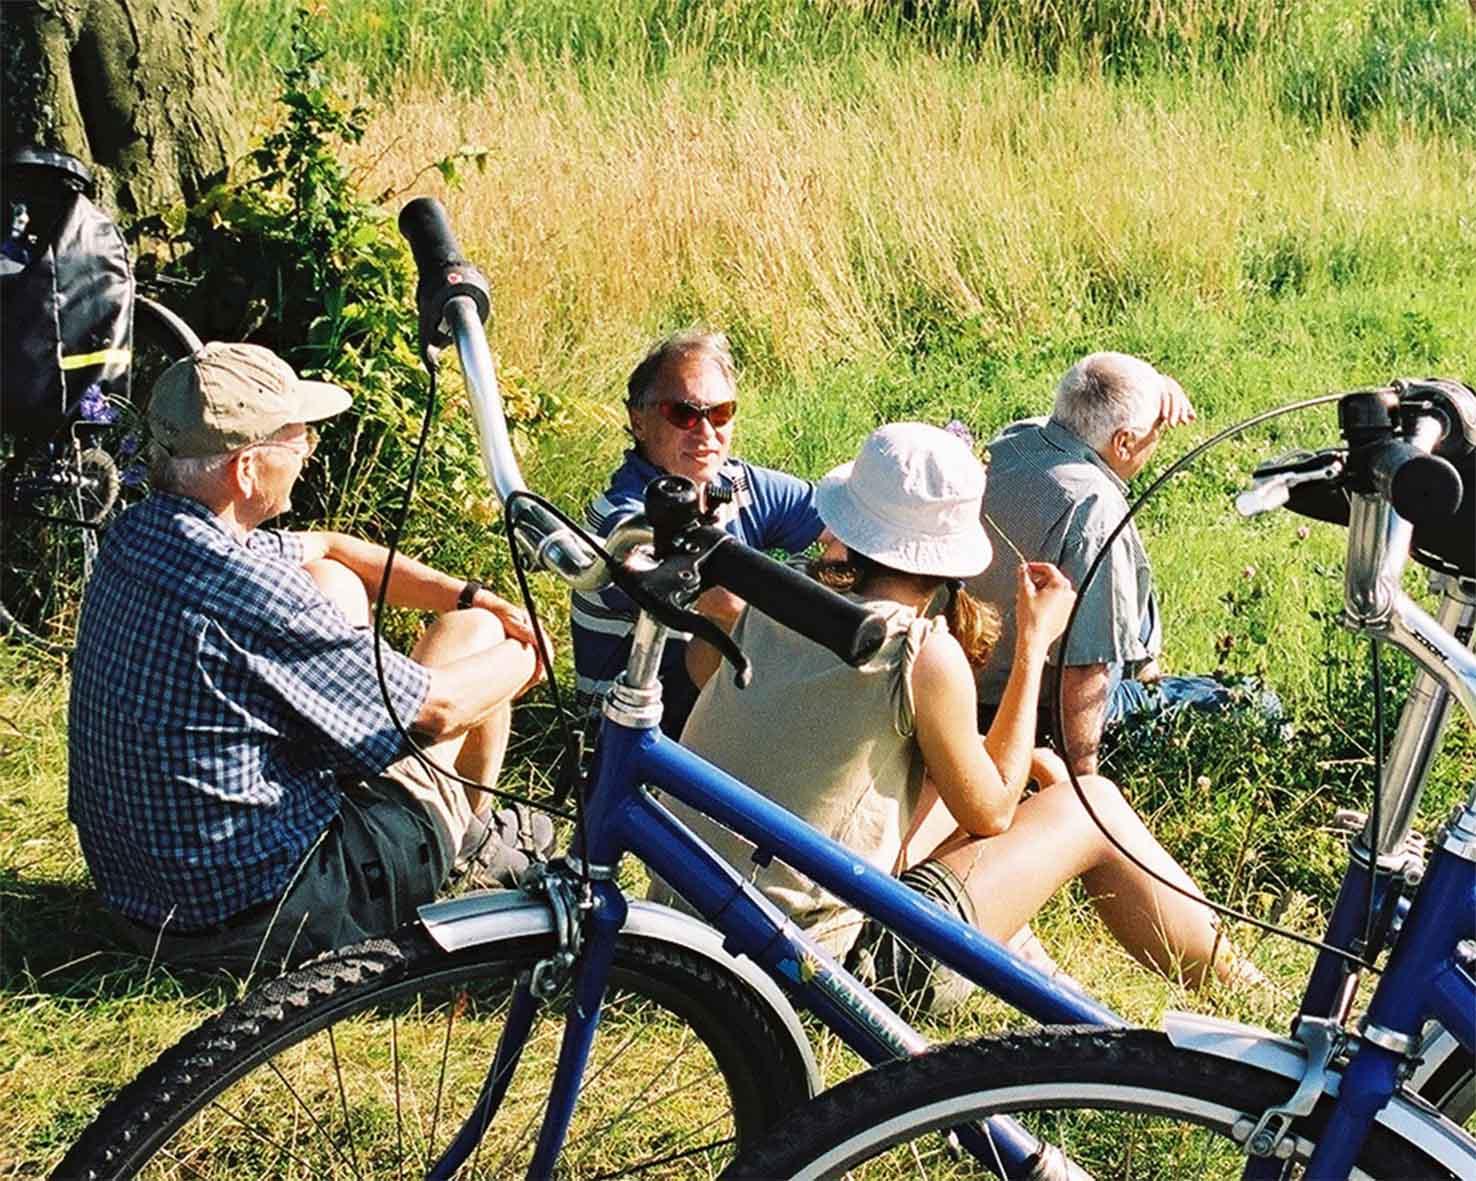 Radreise Polen, MRSI, Fot. 5